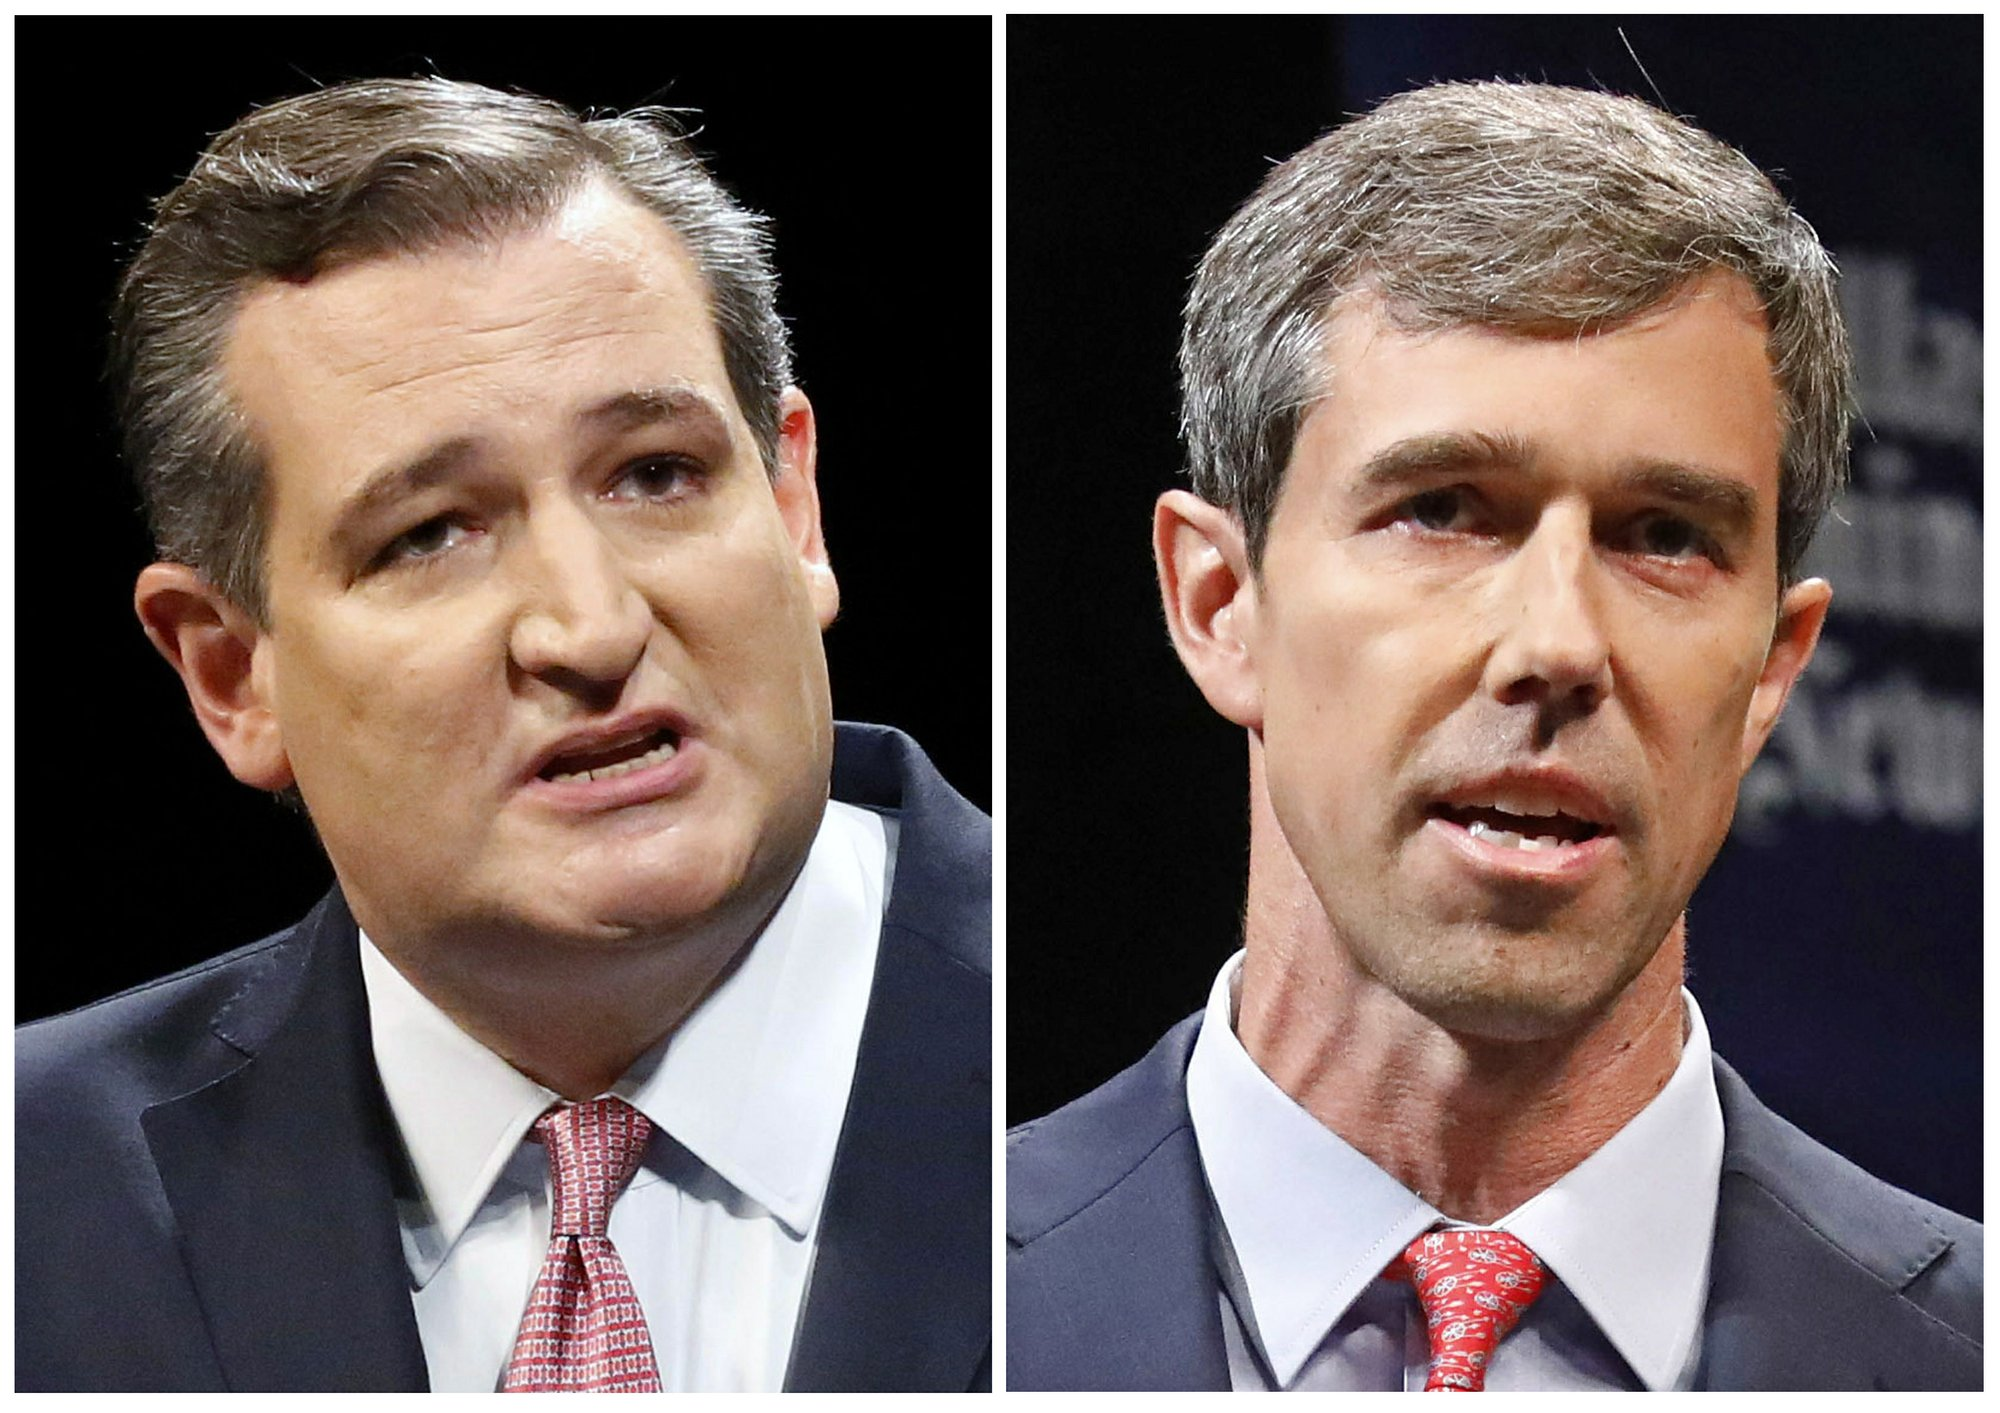 O'Rourke raises record $38M, triples Cruz amid sagging polls